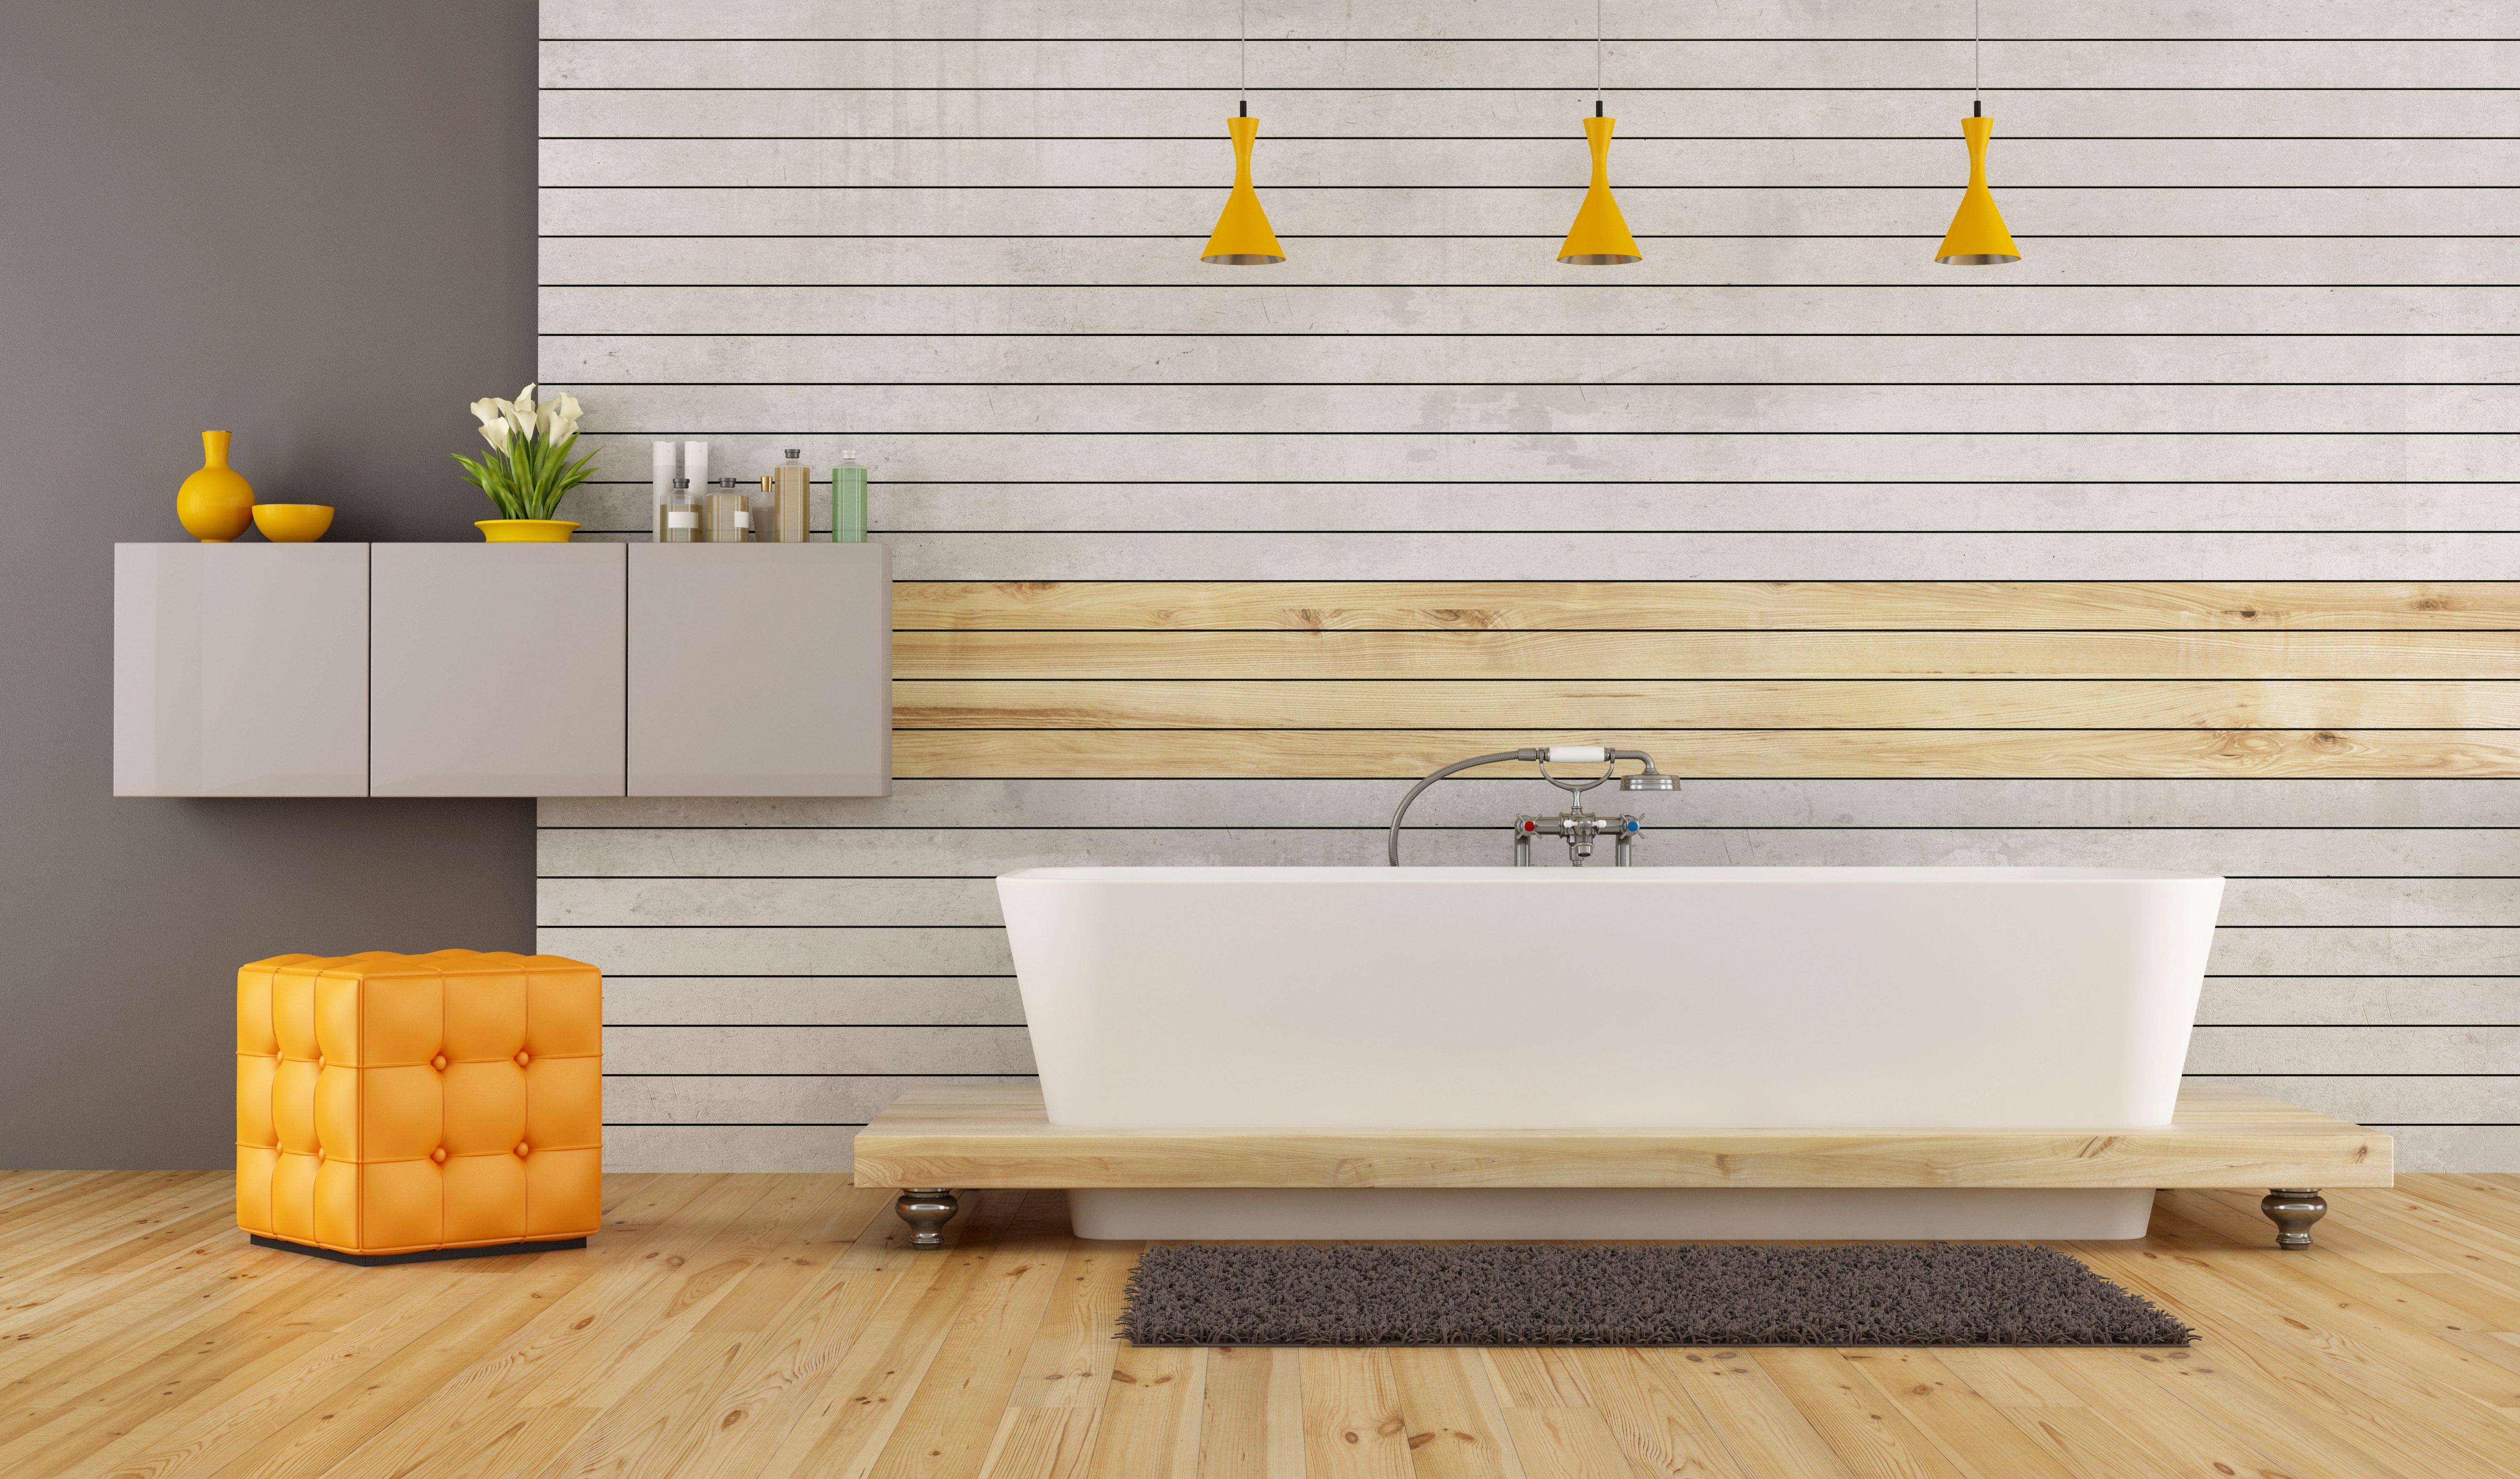 Rendering of horizontal interior Pinoli wall cladding used for a bathroom